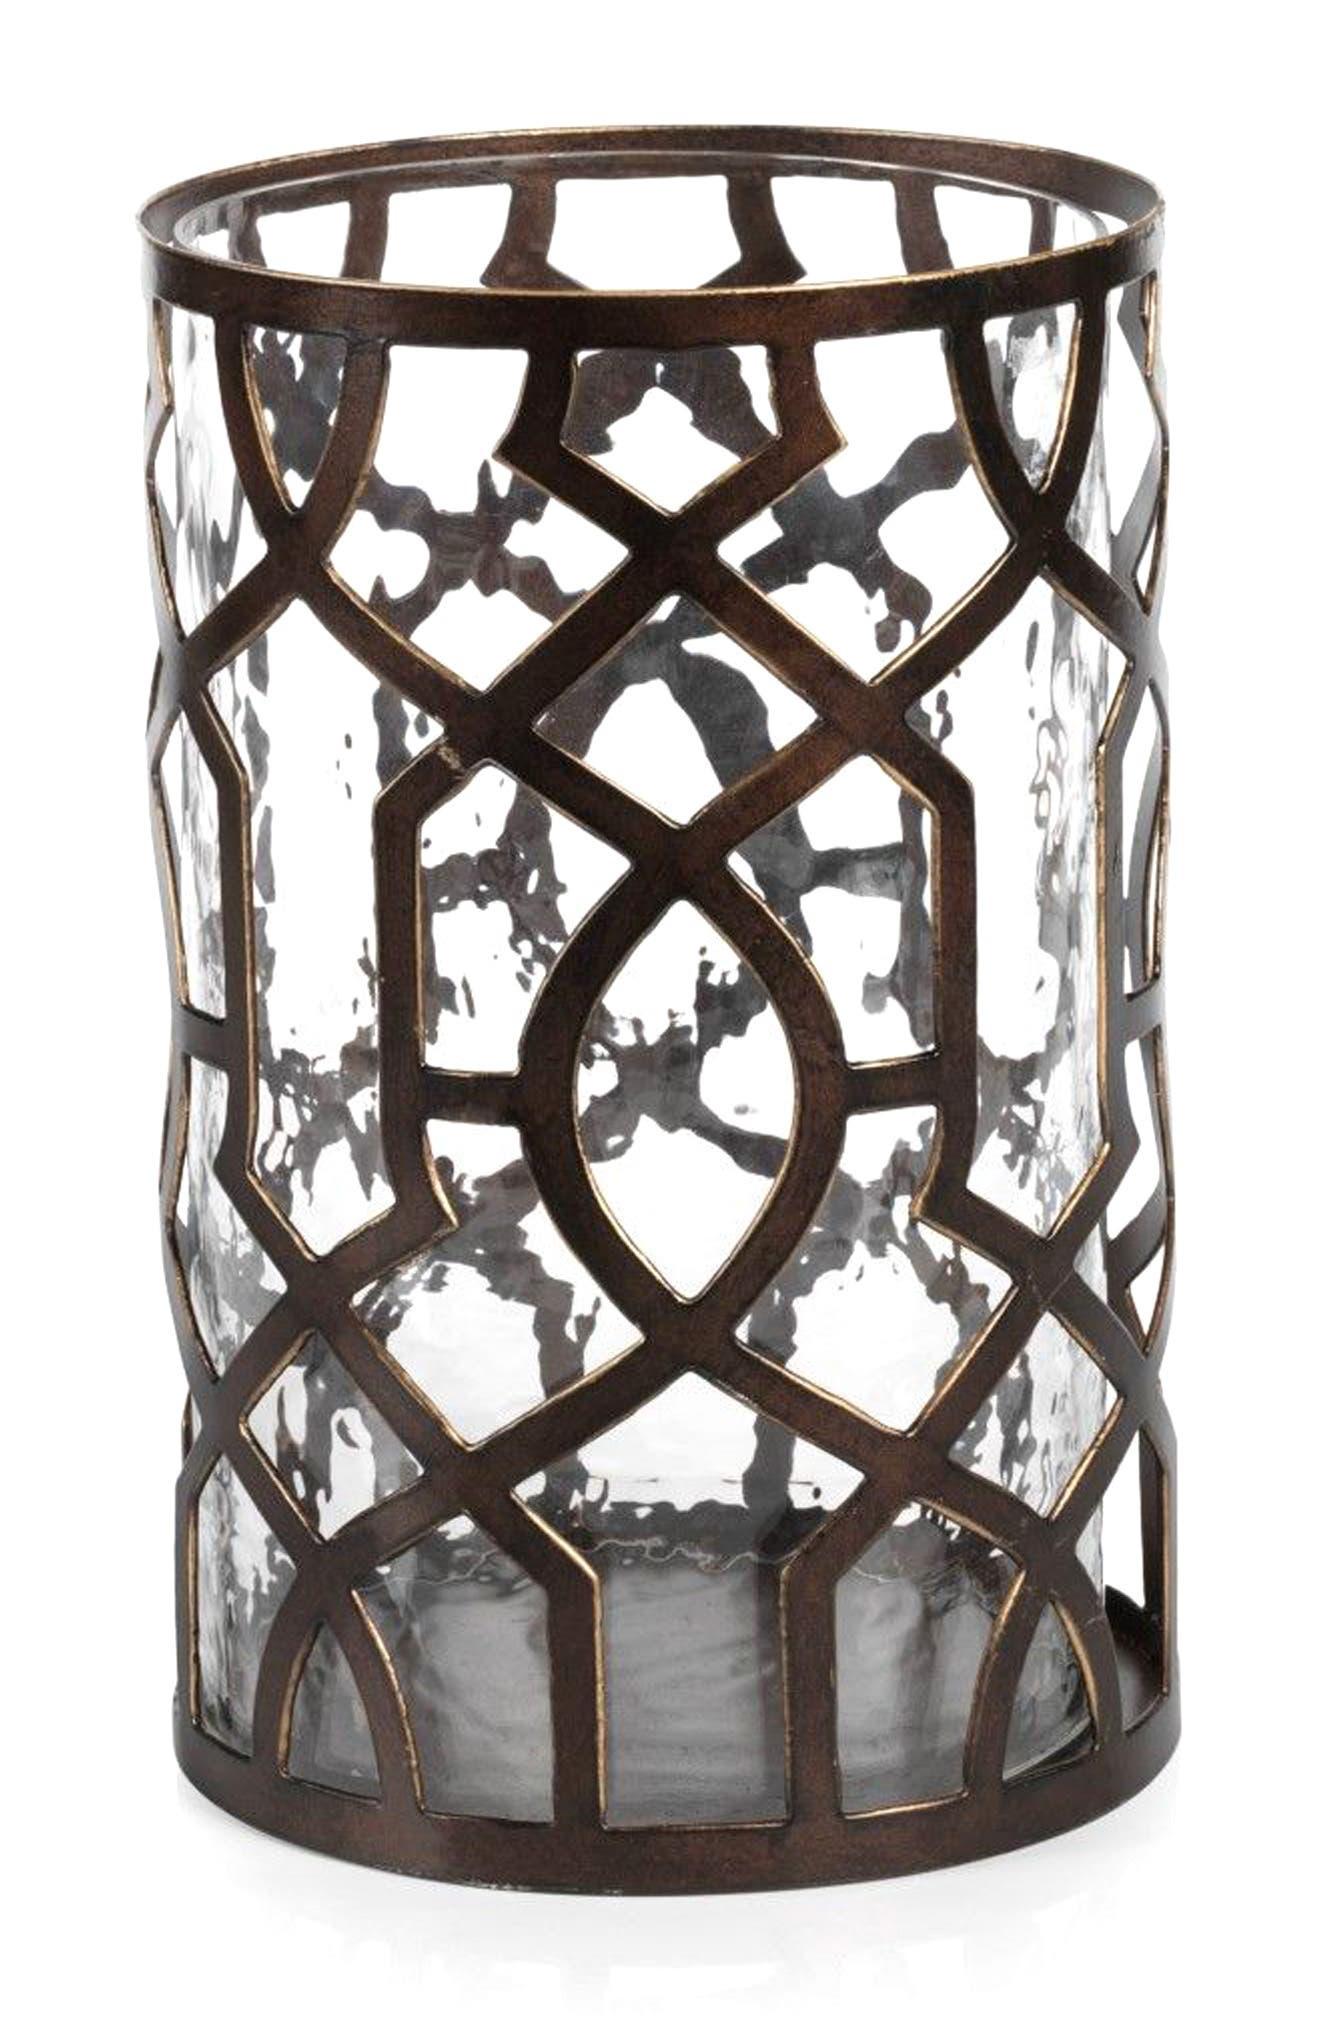 Large Trocadero Hurricane Candle Holder,                         Main,                         color, Metallic/ Silver/ Grey